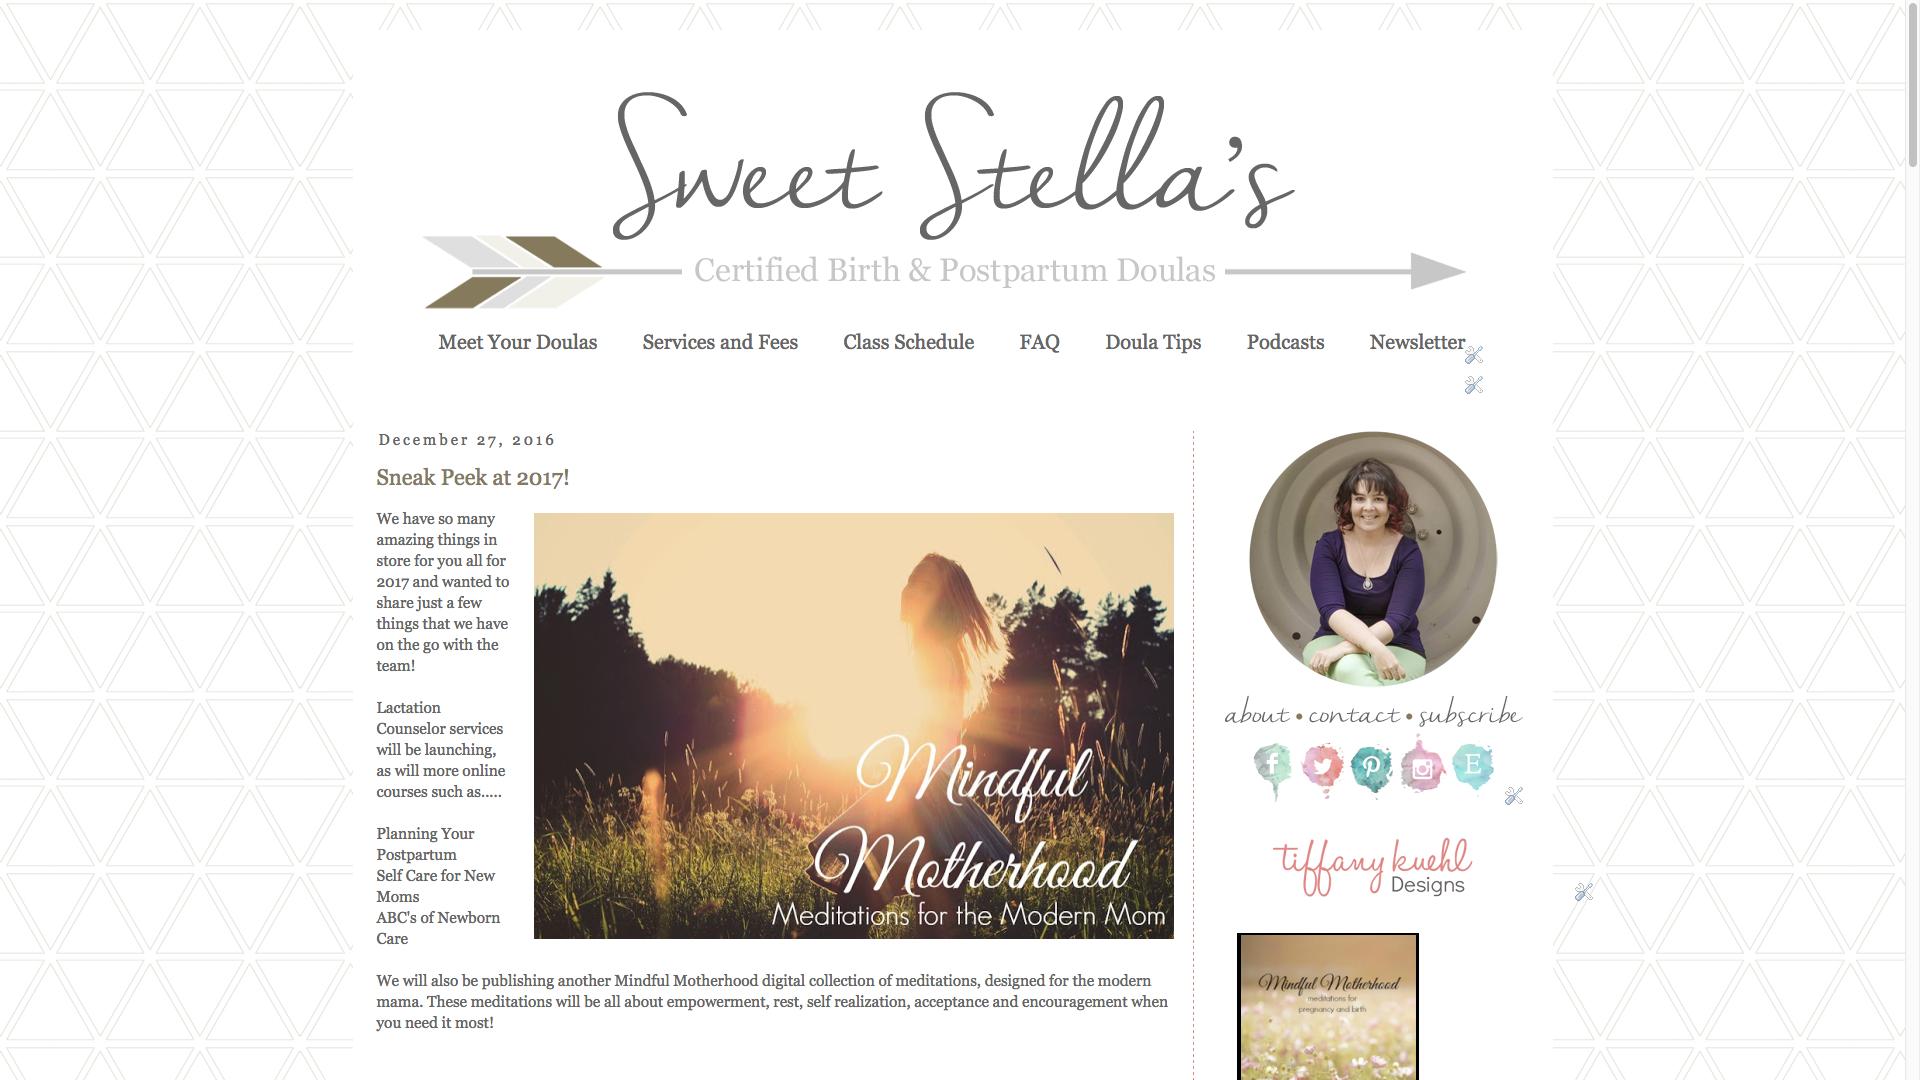 Sweet Stella's Blogger Design   Tiffany Kuehl Designs